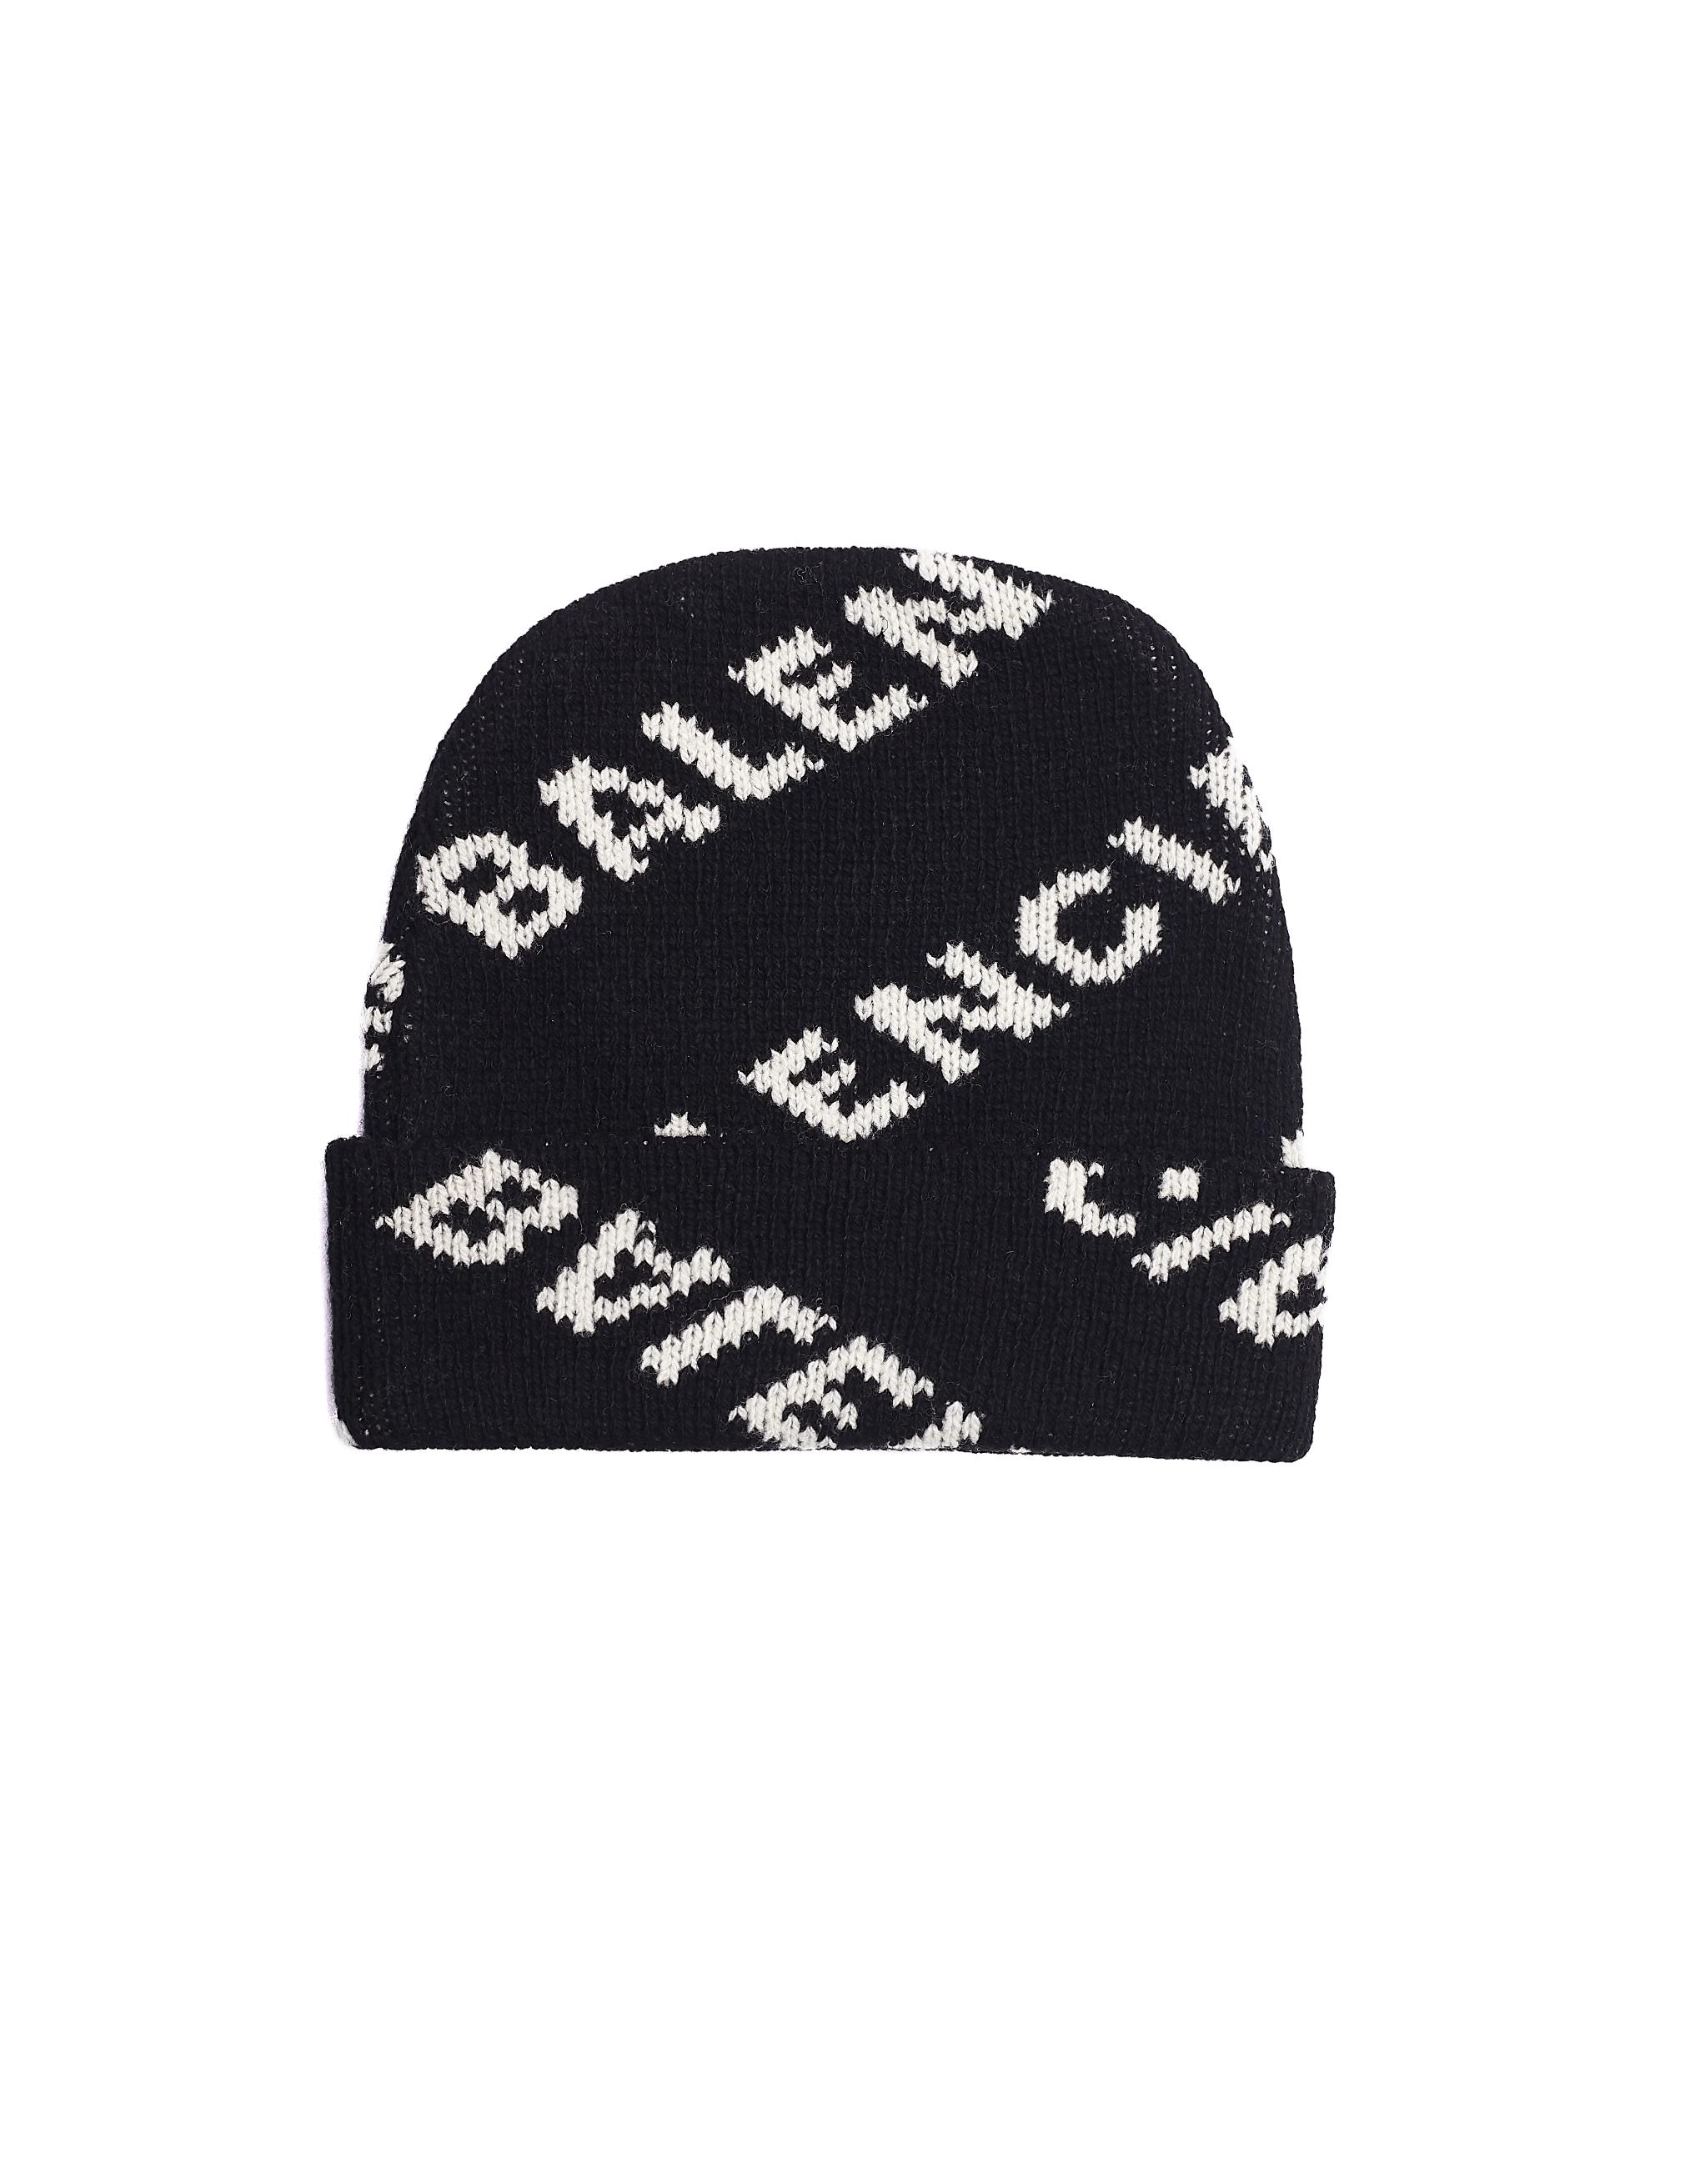 49efb847 Balenciaga Jacquard Logo Beanie - black | Garmentory